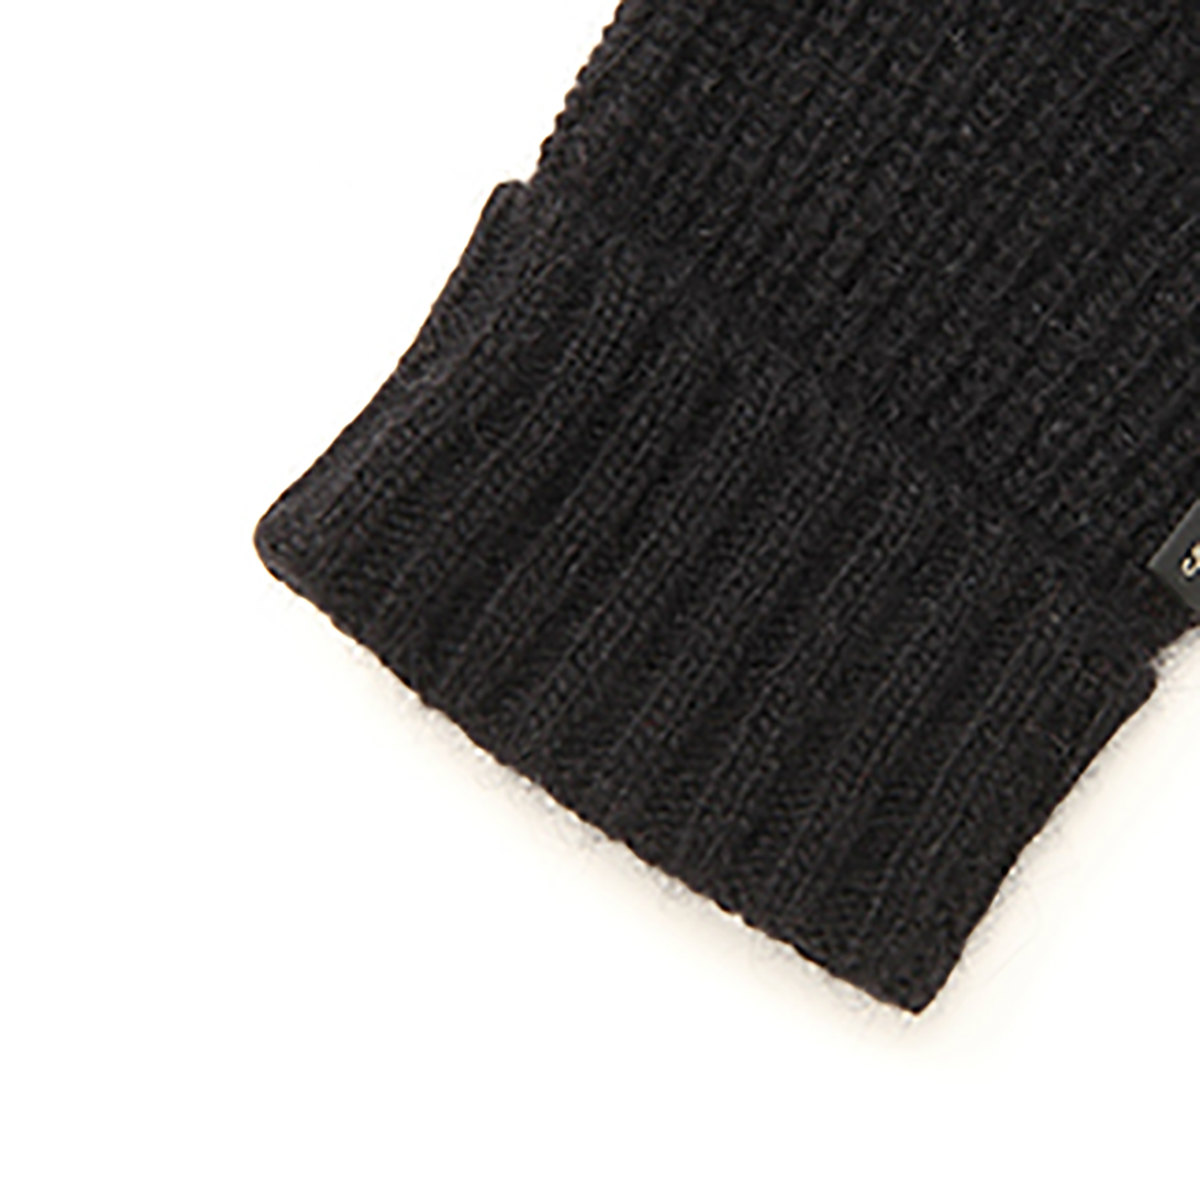 DAKS シンプル アンゴラ混ニット メンズ 手袋 フリーサイズ 全4色